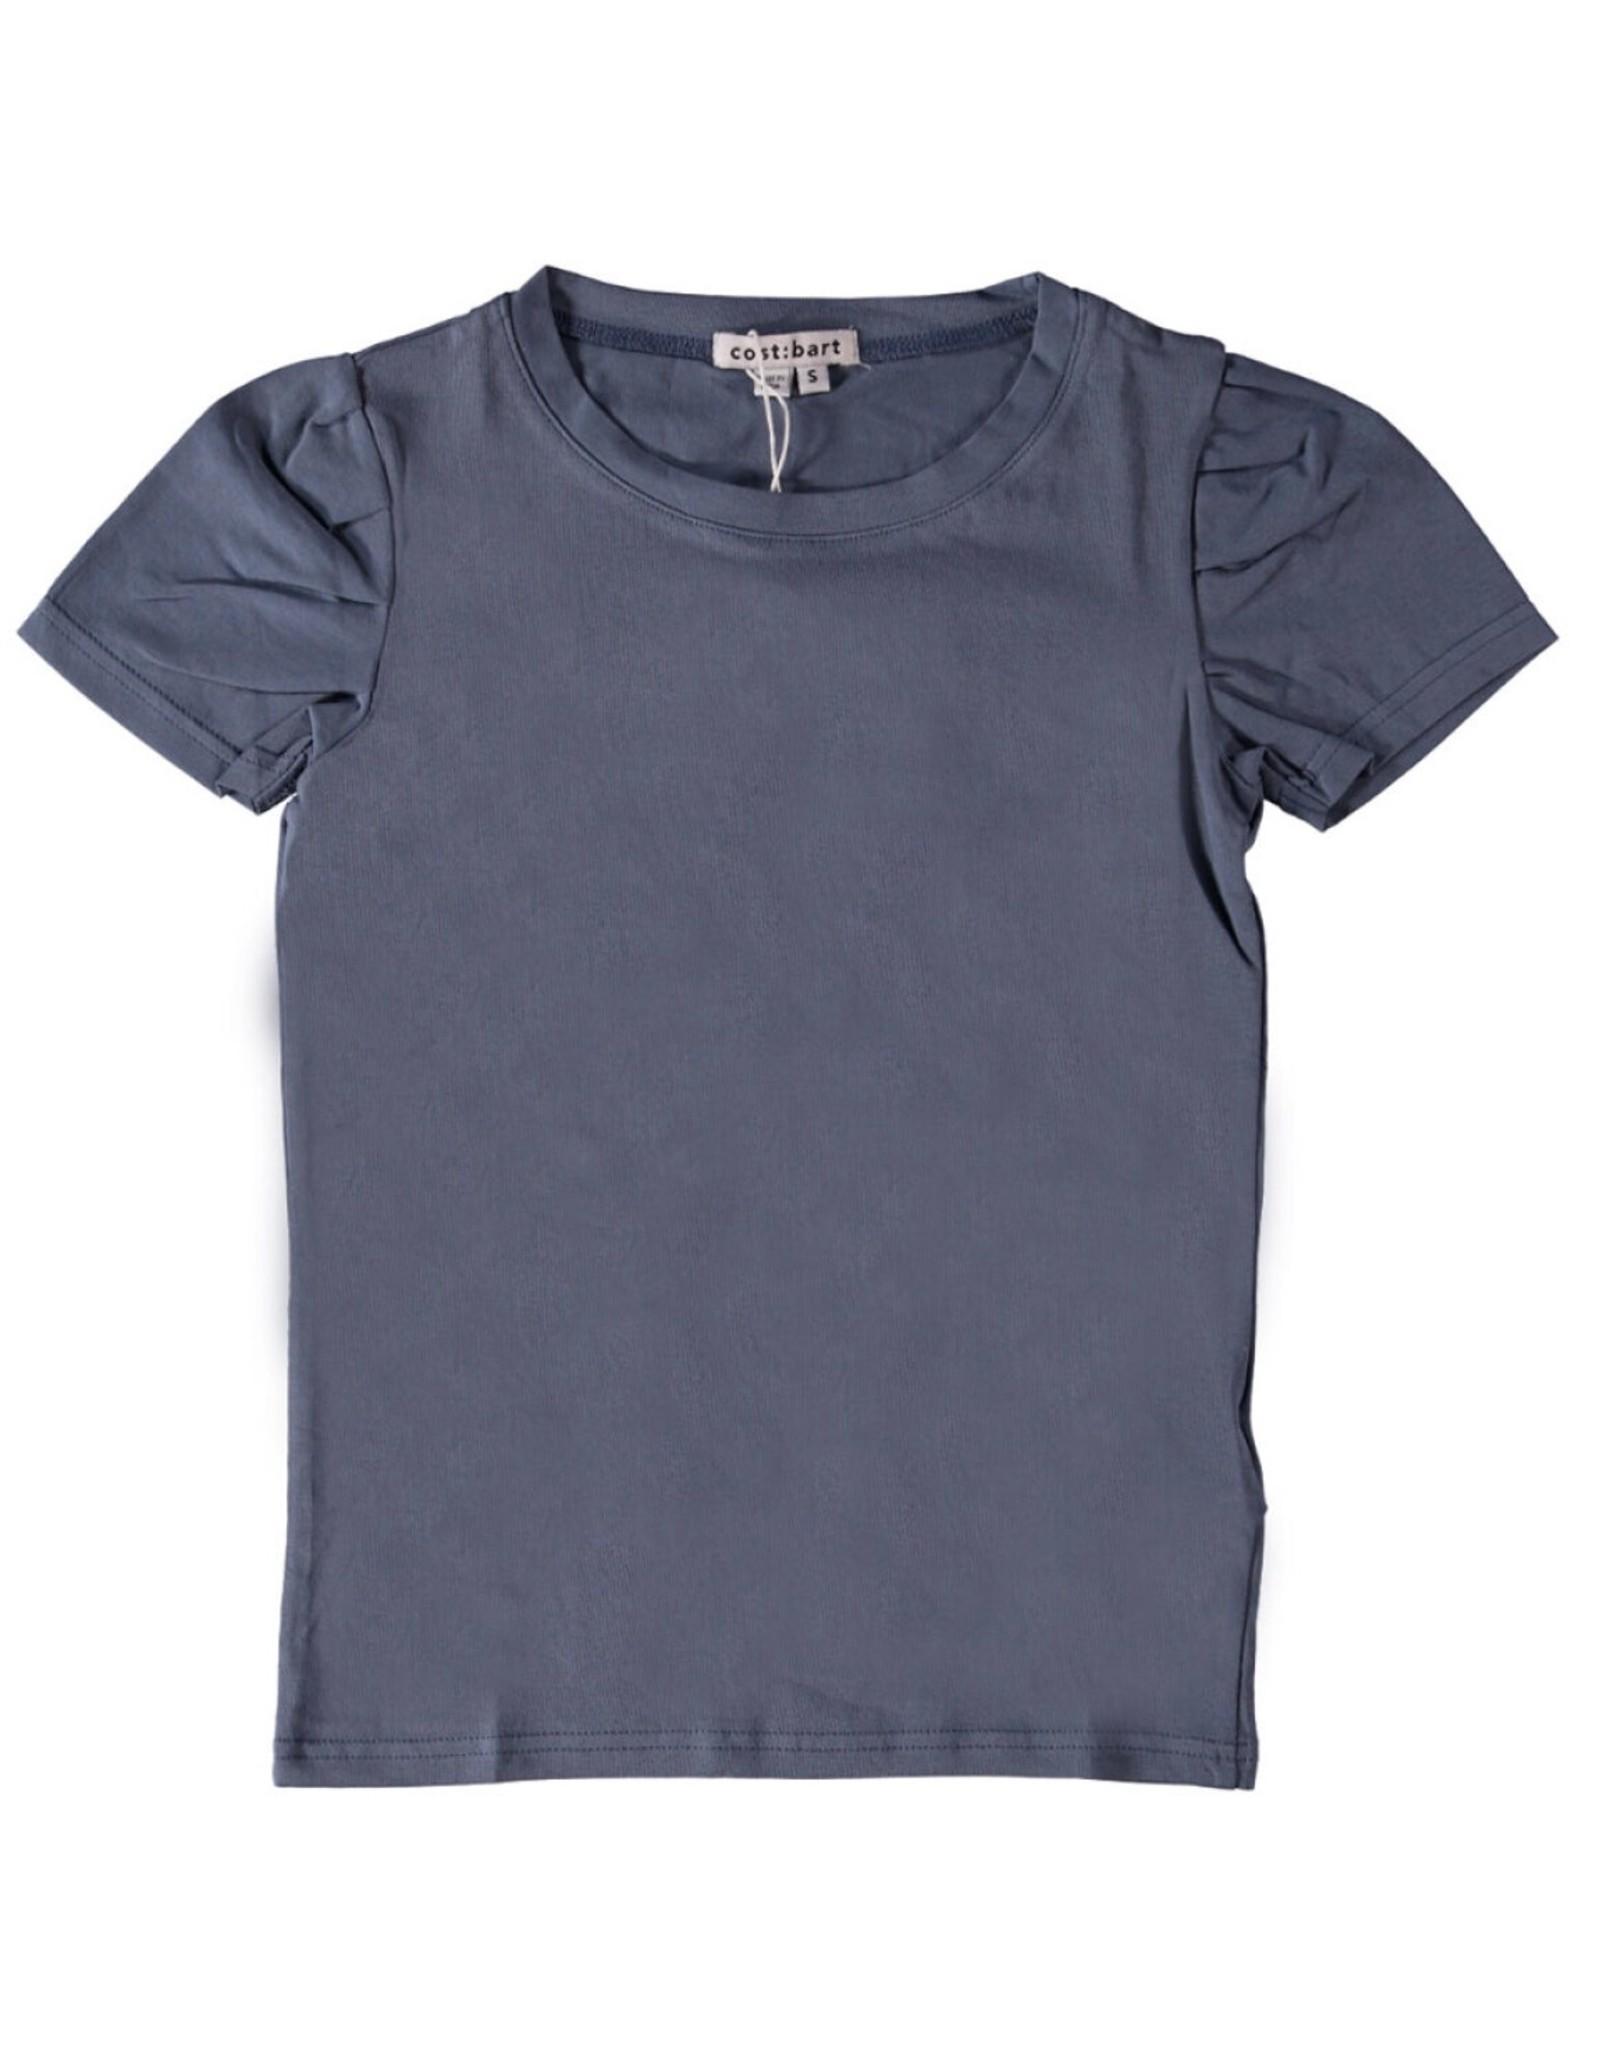 Cost Bart CBOlady T-Shirt